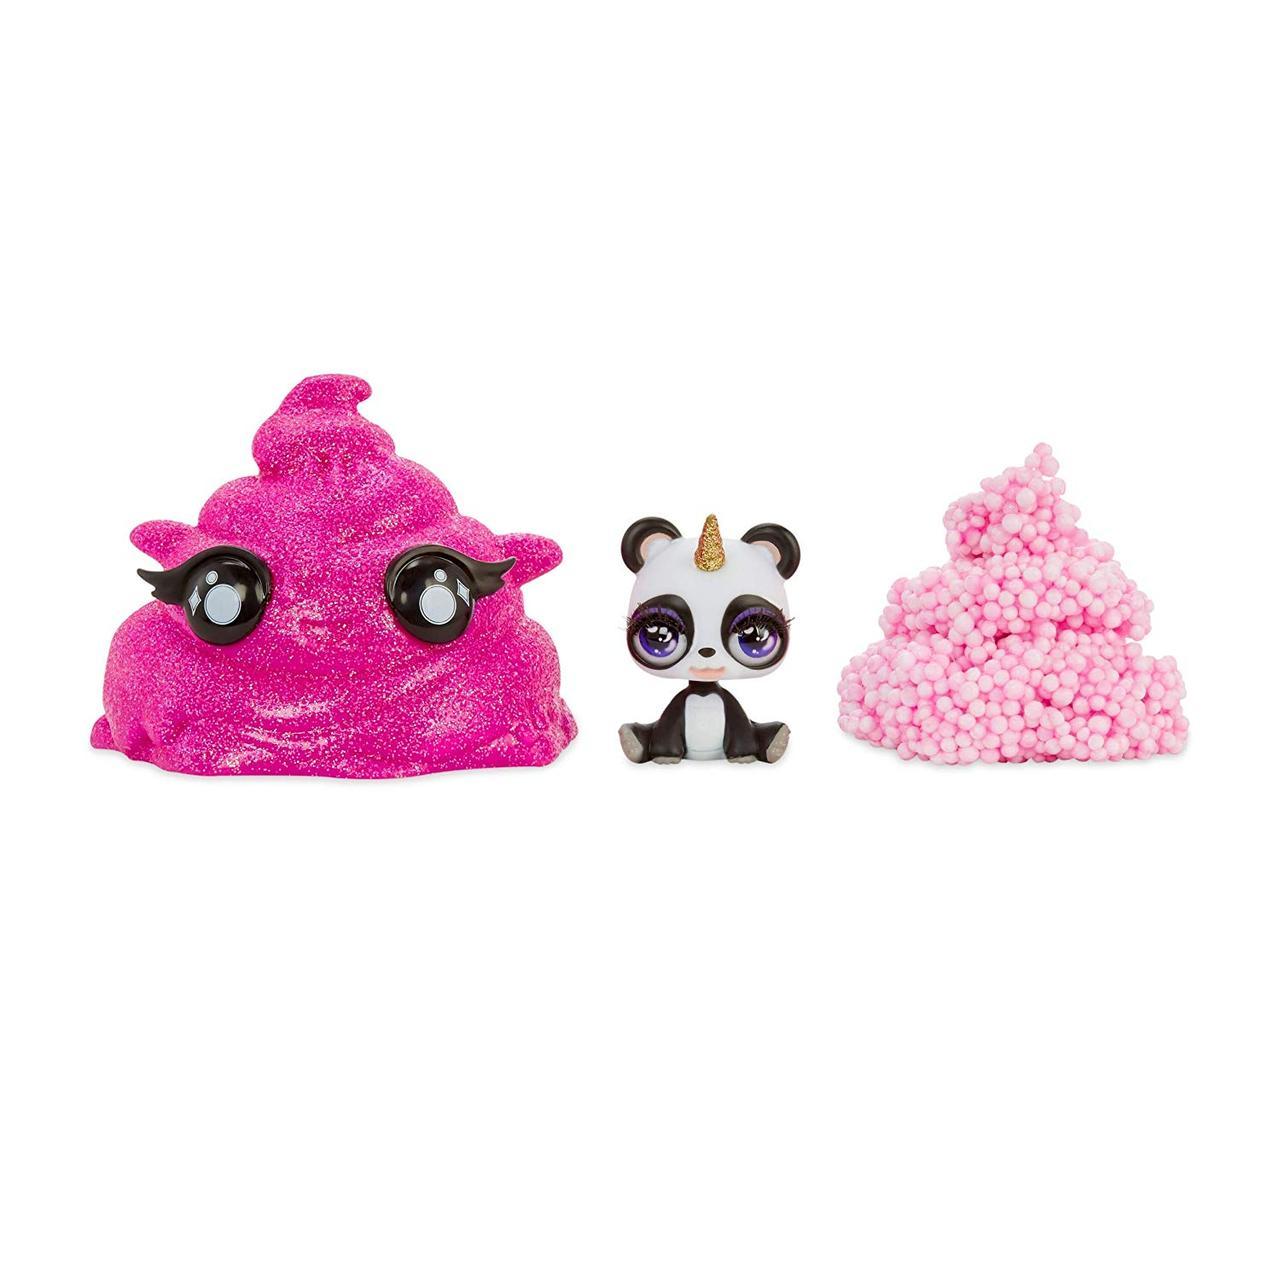 Чудо-сюрприз со слаймом Poopsie Cutie tooties surprise 555797, фото 5